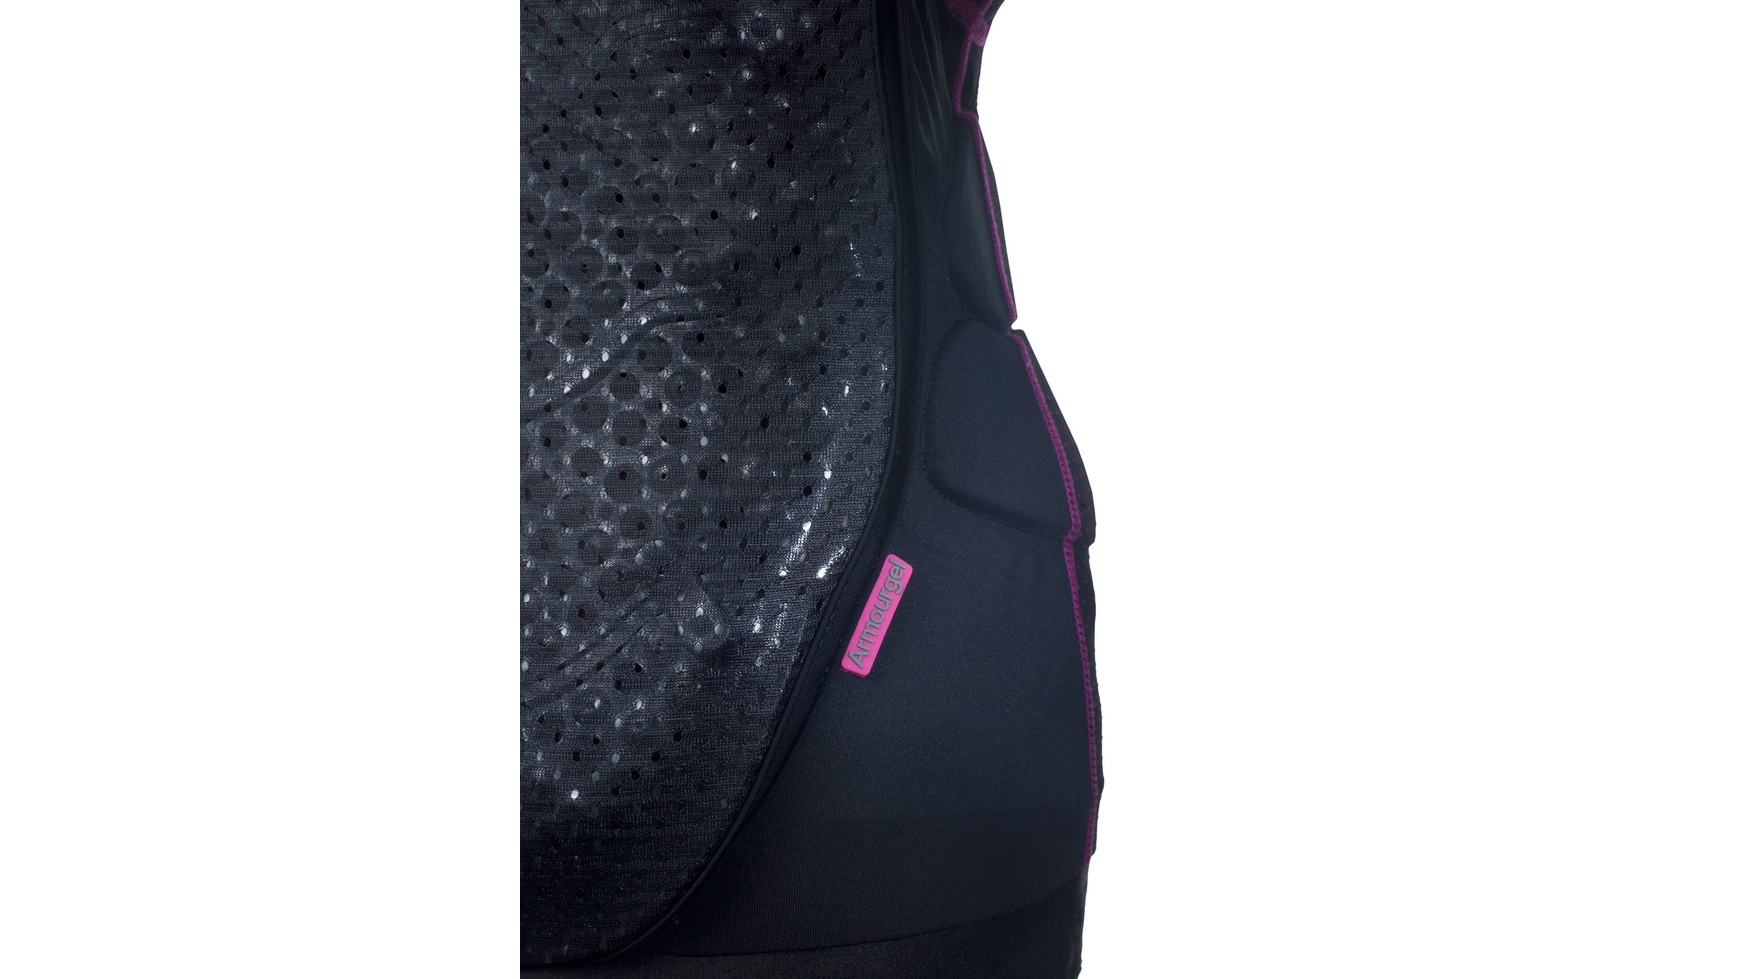 280001001-amplifi_mkii_jacket_woman_detail07